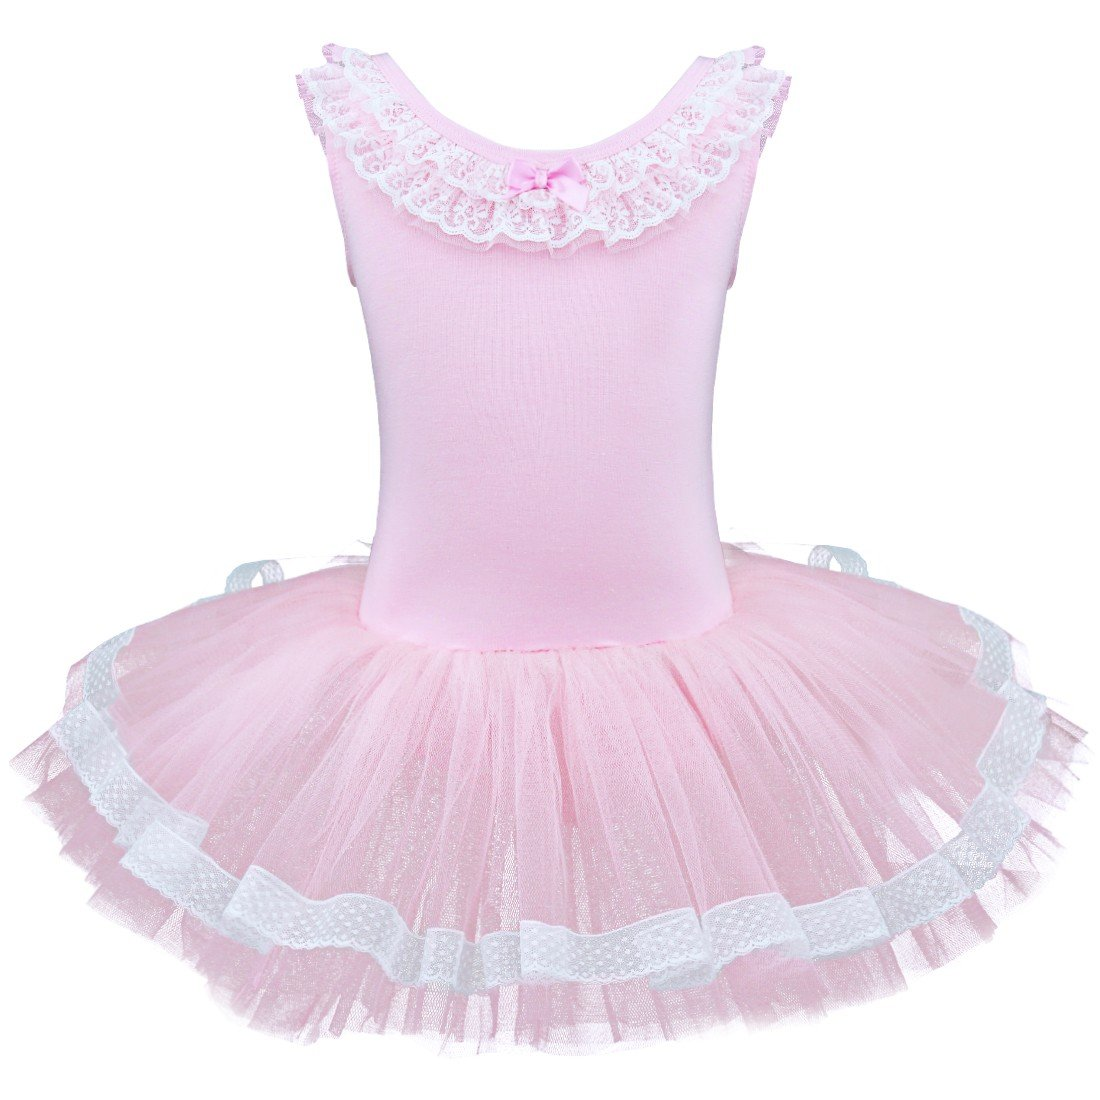 ACSUSS DRESS ガールズ B07H7CMT3L  ピンク 43560